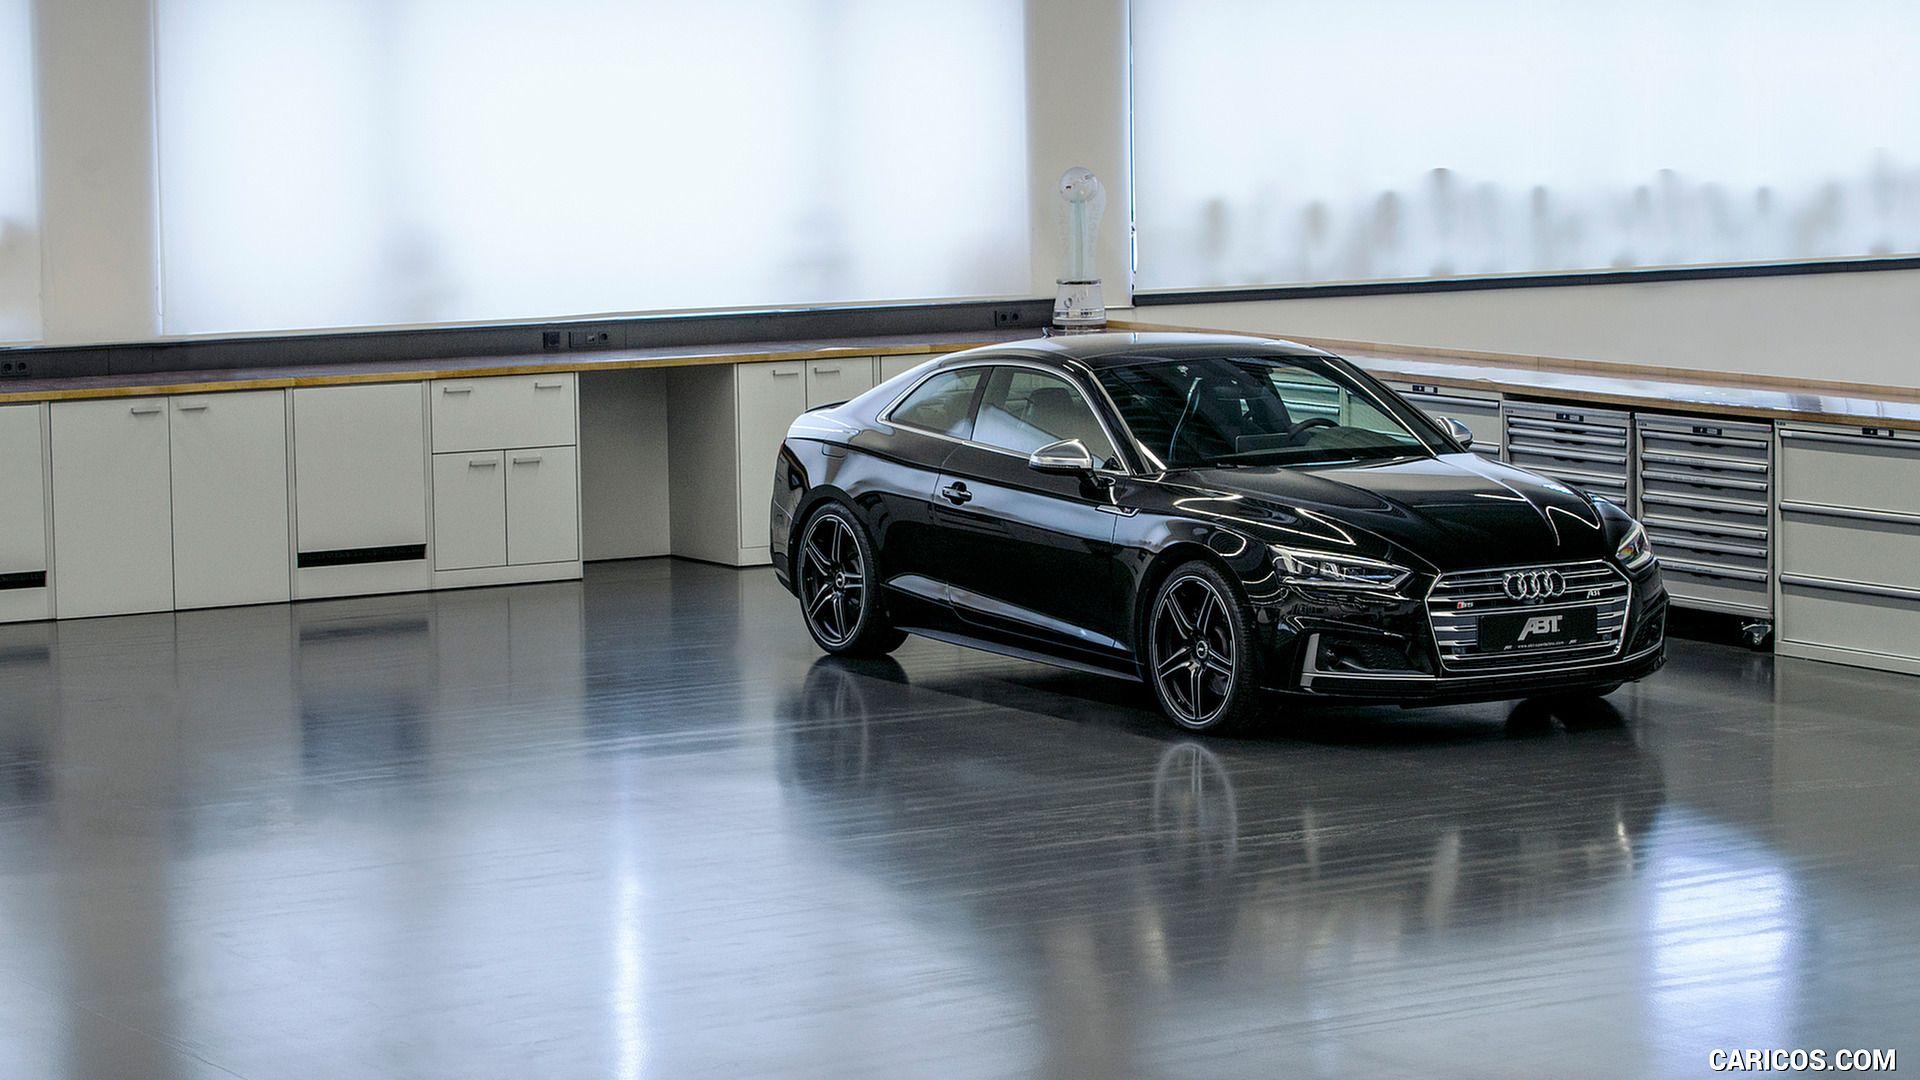 2018 ABT Audi S5 Coupe Wallpaper